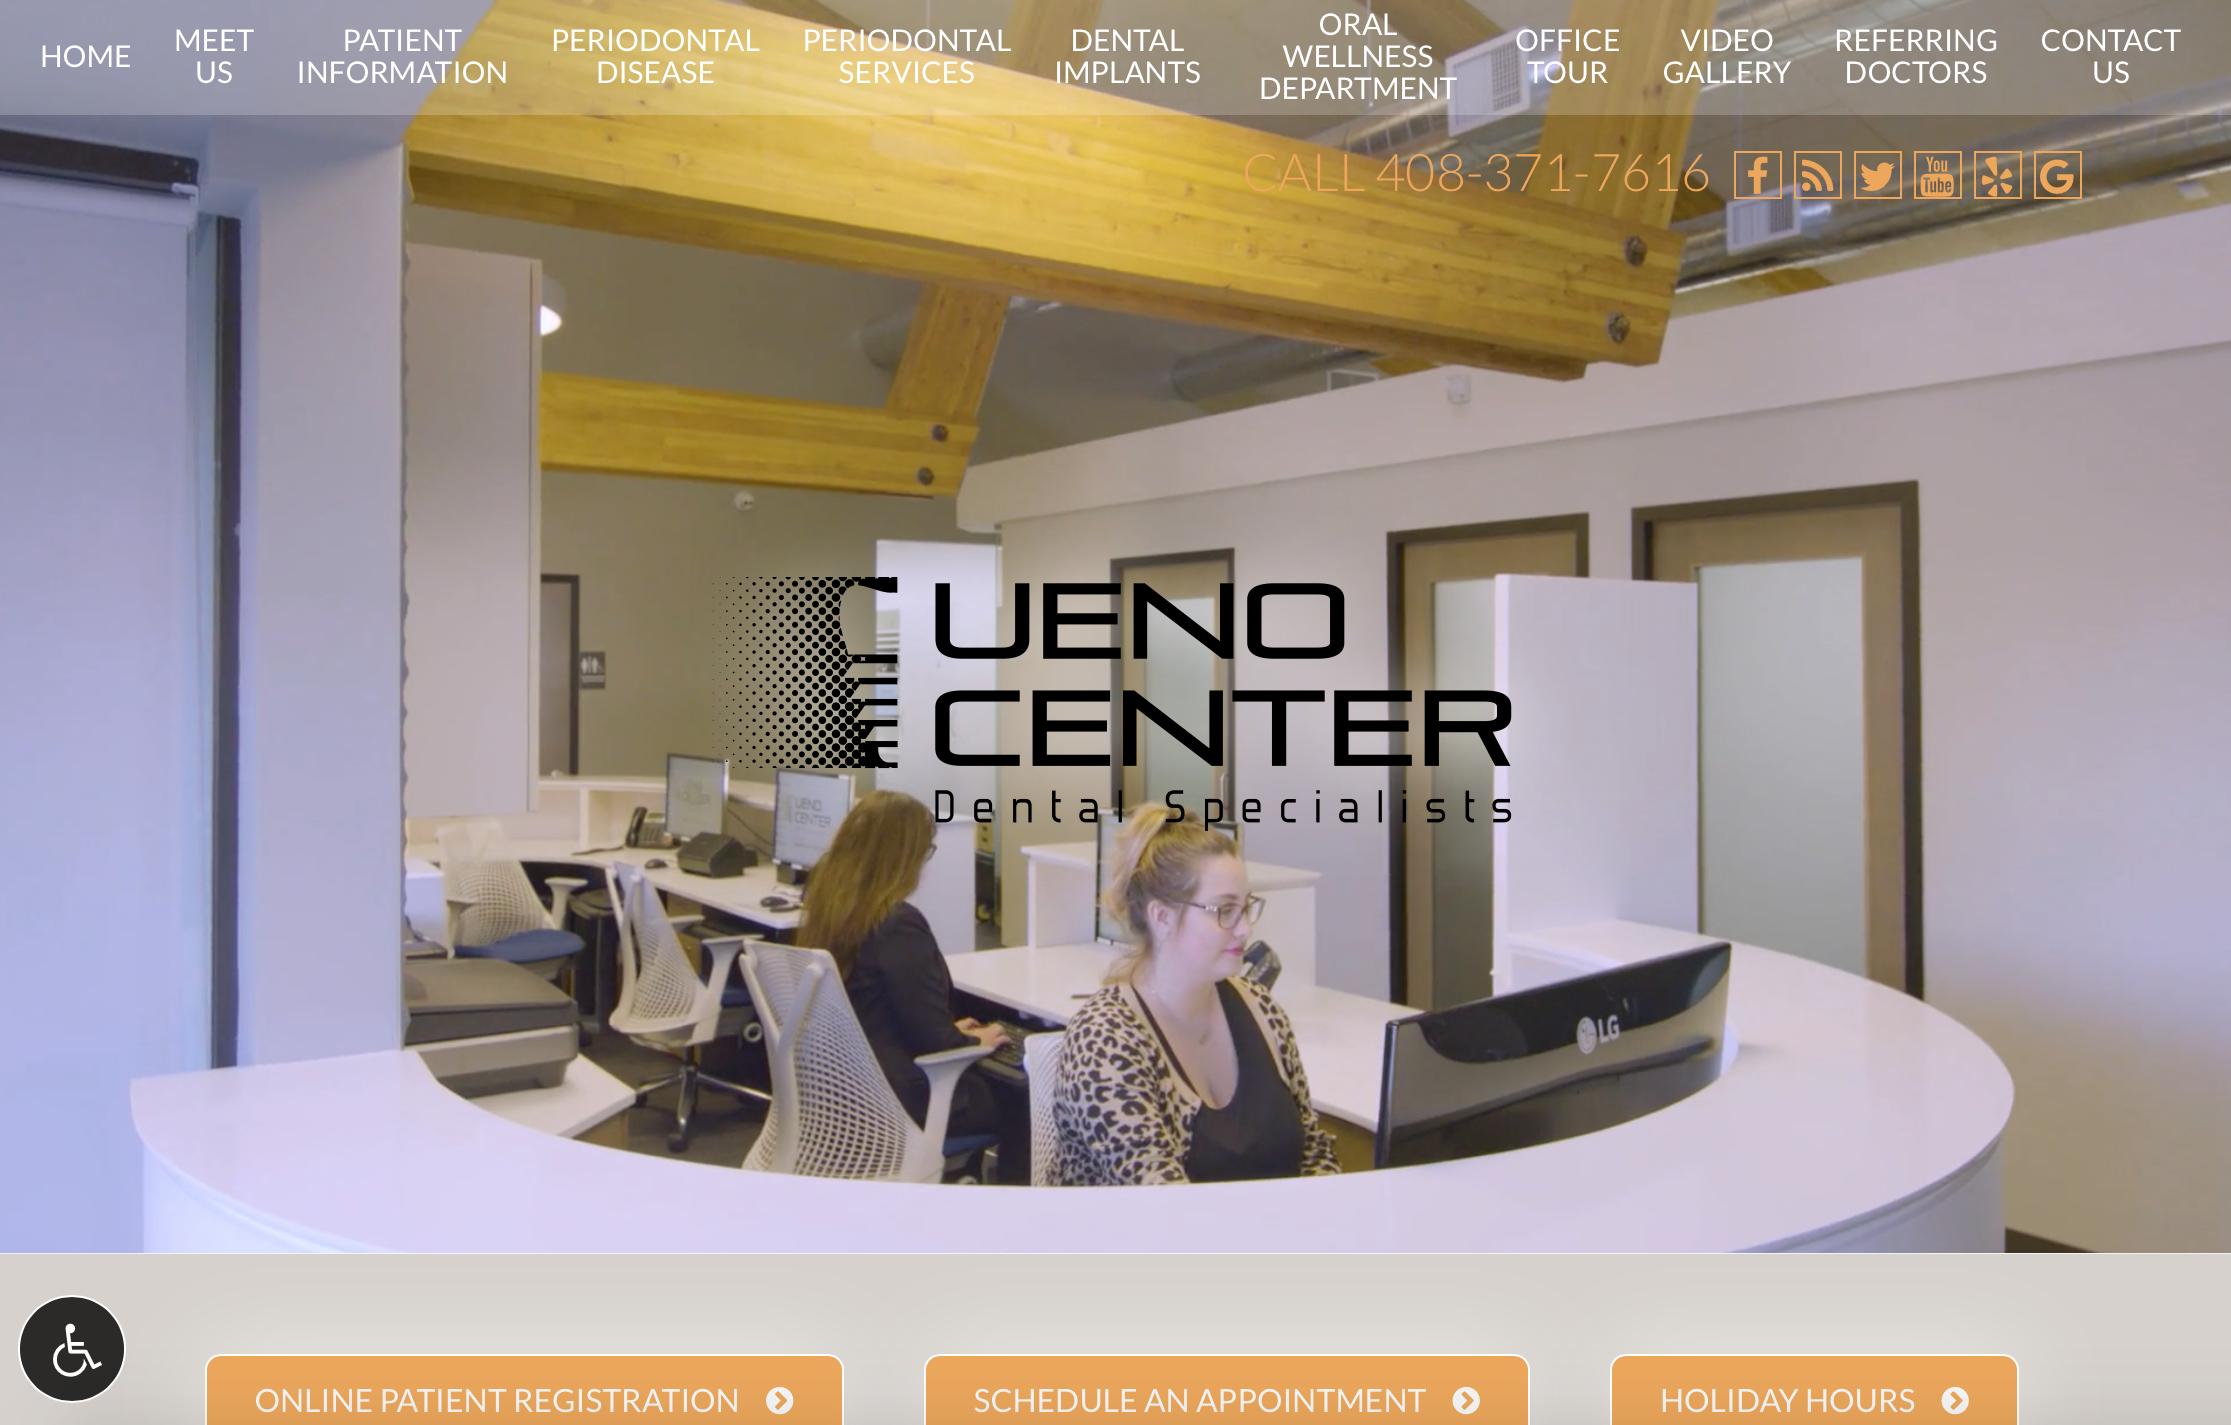 Dental Website strategy Ueno Center Dental Specialists